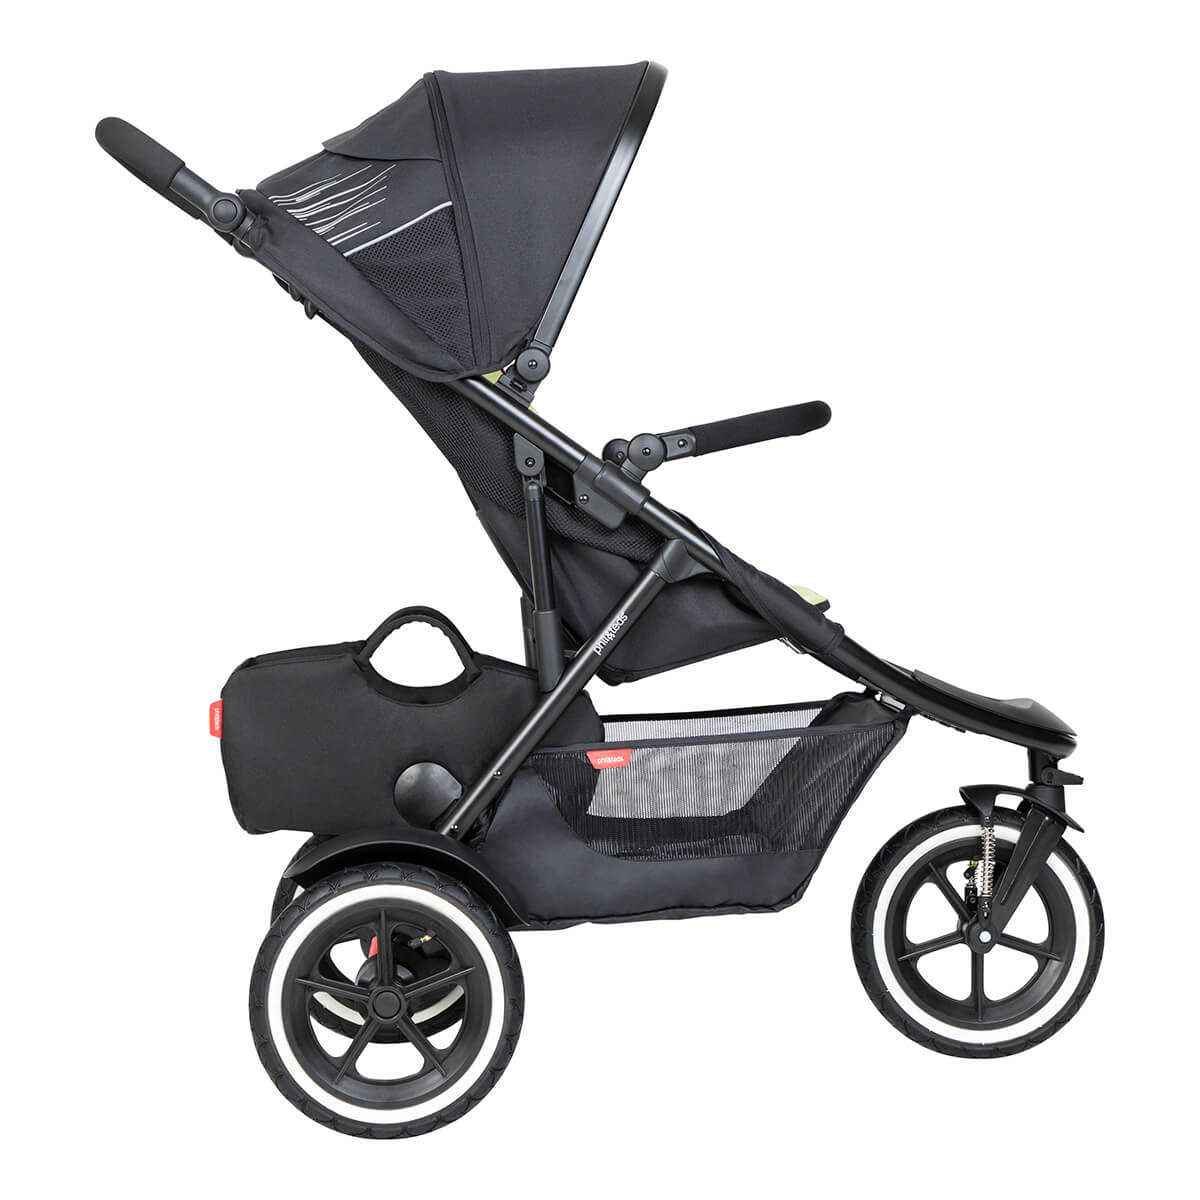 poussette-sport-3-roues-buggy-phil-teds-neuf-mois-panier-courses-fixe